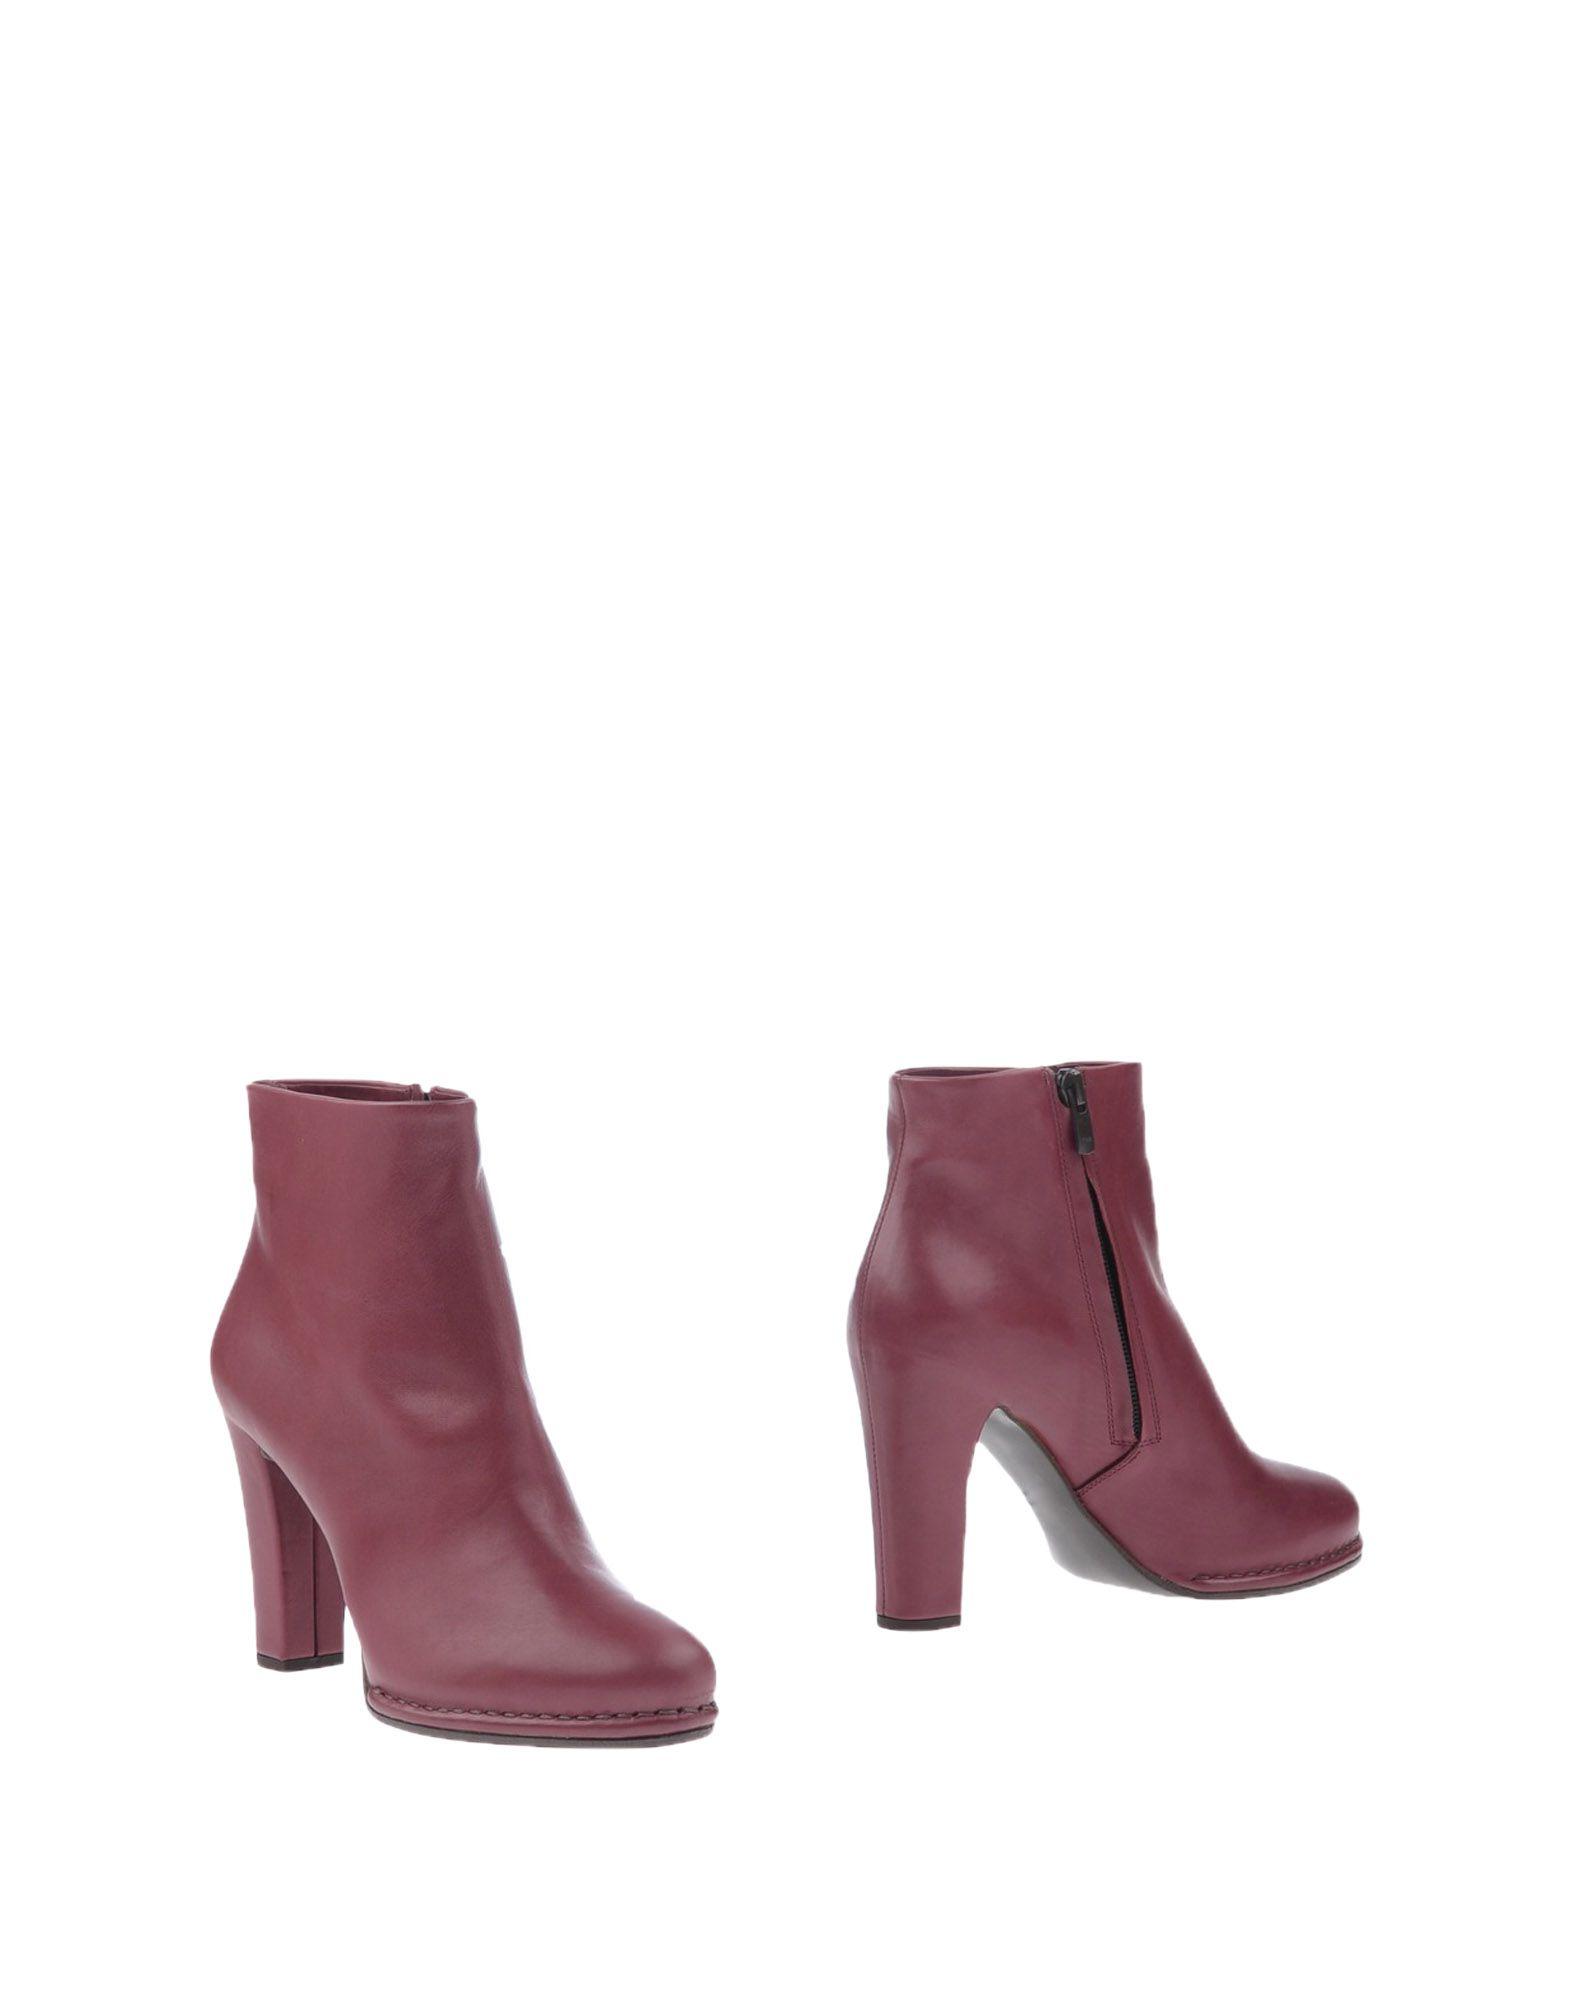 ROBERTO DEL CARLO Полусапоги и высокие ботинки del gatto полусапоги и высокие ботинки